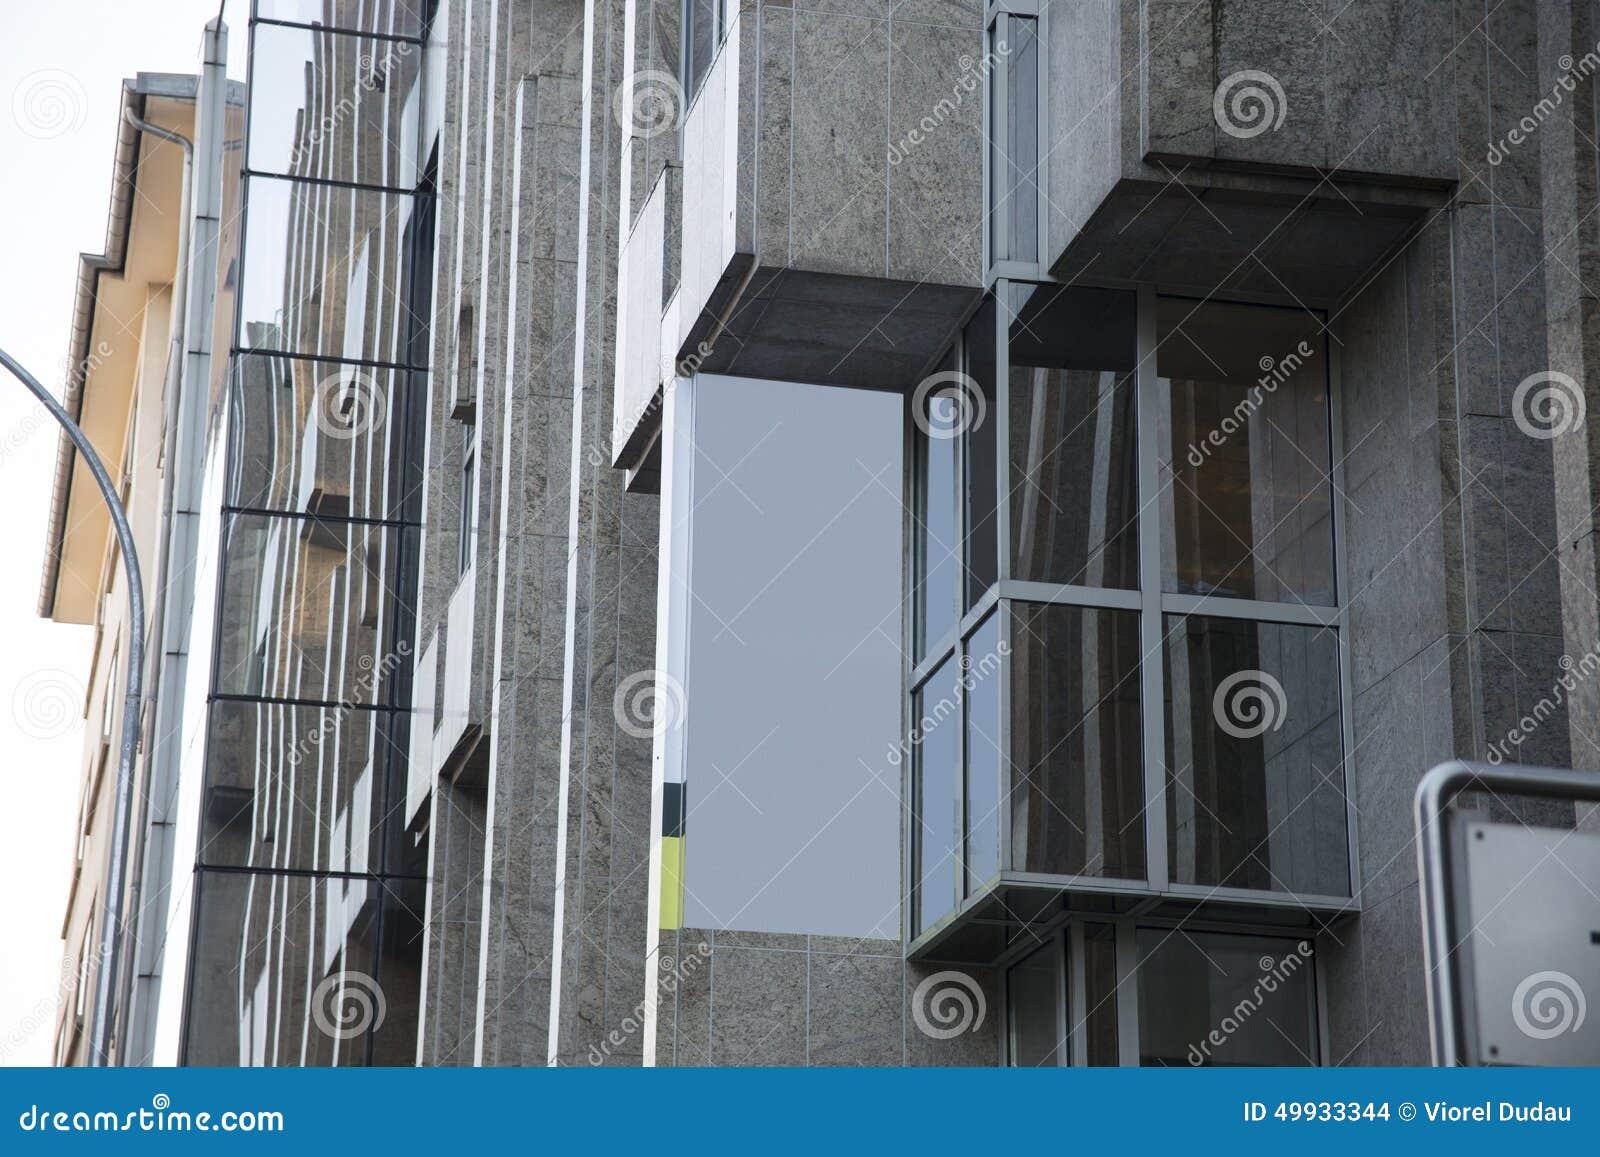 Blank advertising banner on block building